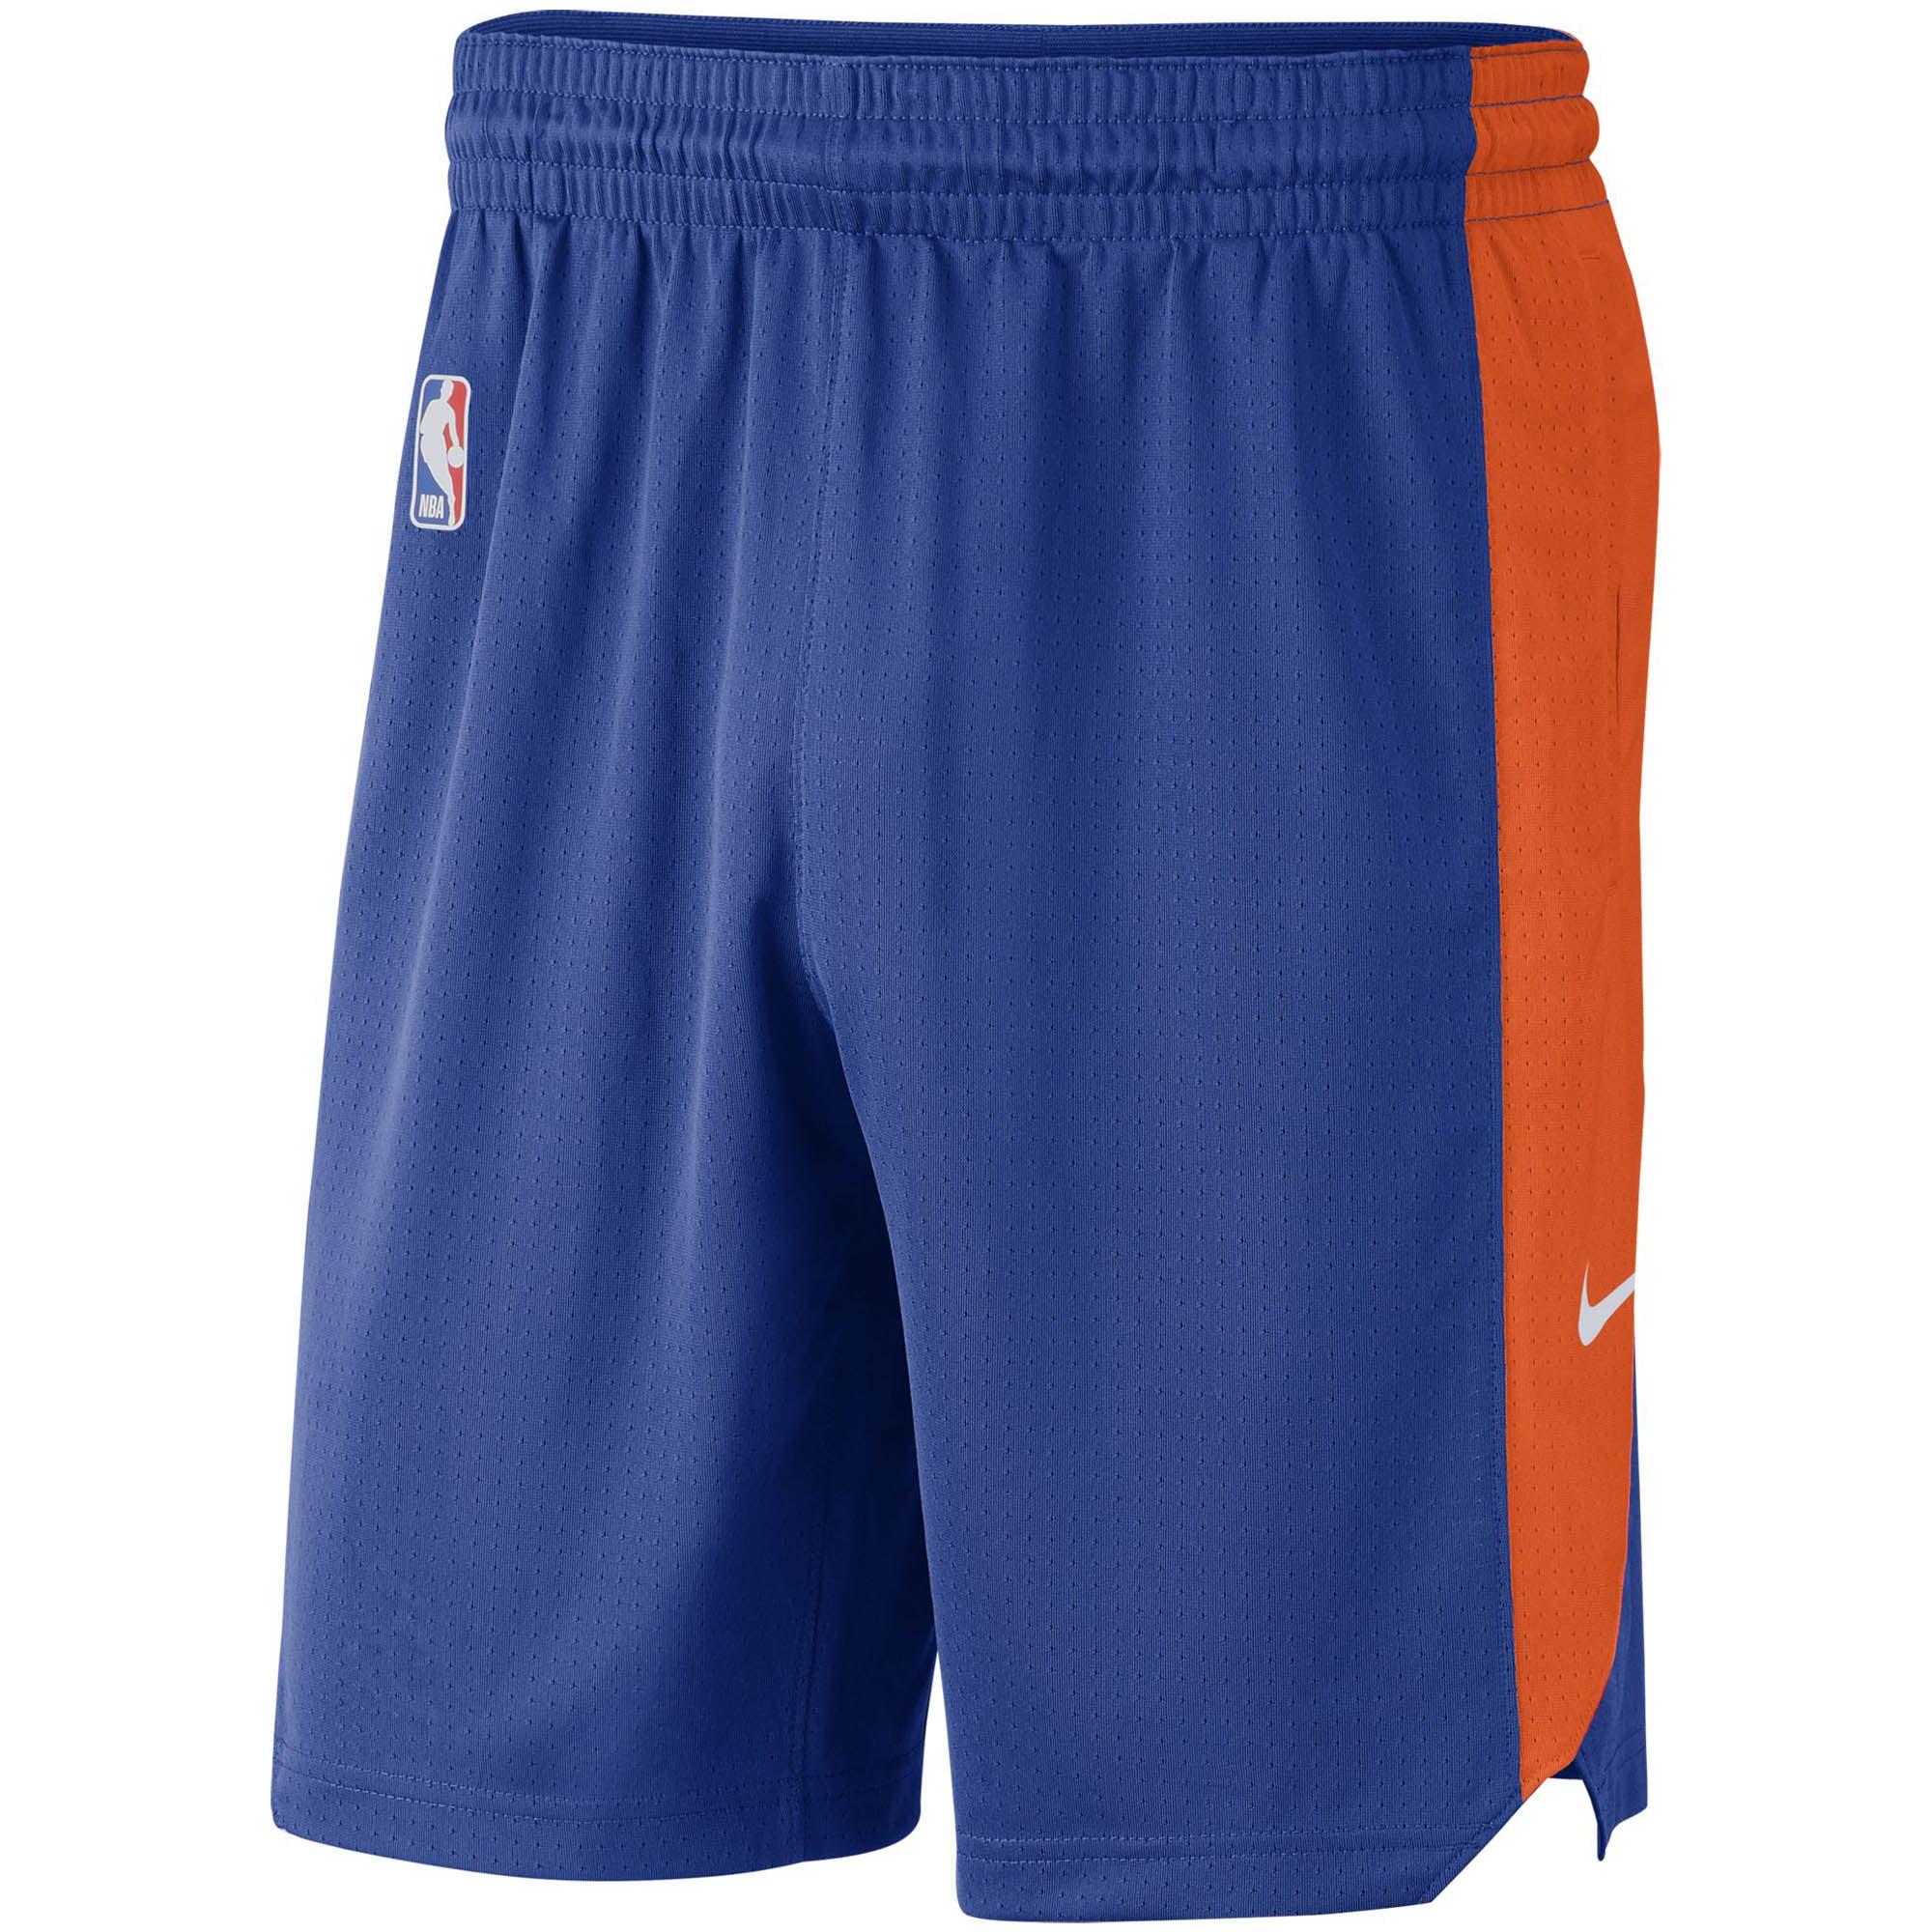 New York Knicks Nike Performance Practice Shorts - Blue